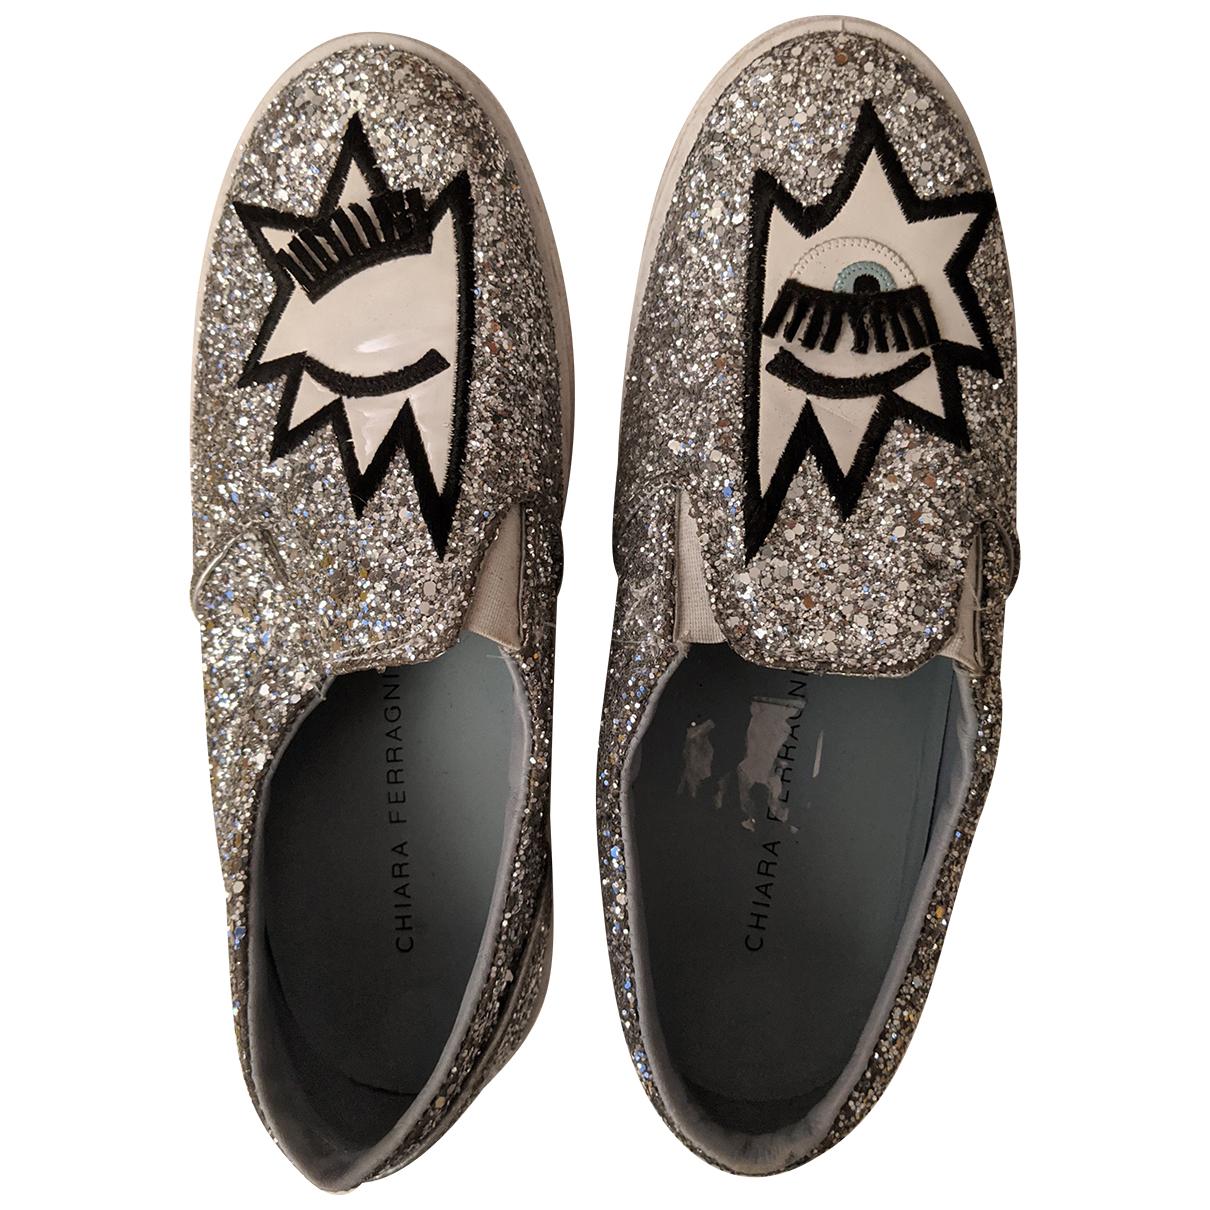 Chiara Ferragni \N Silver Glitter Espadrilles for Women 38 IT